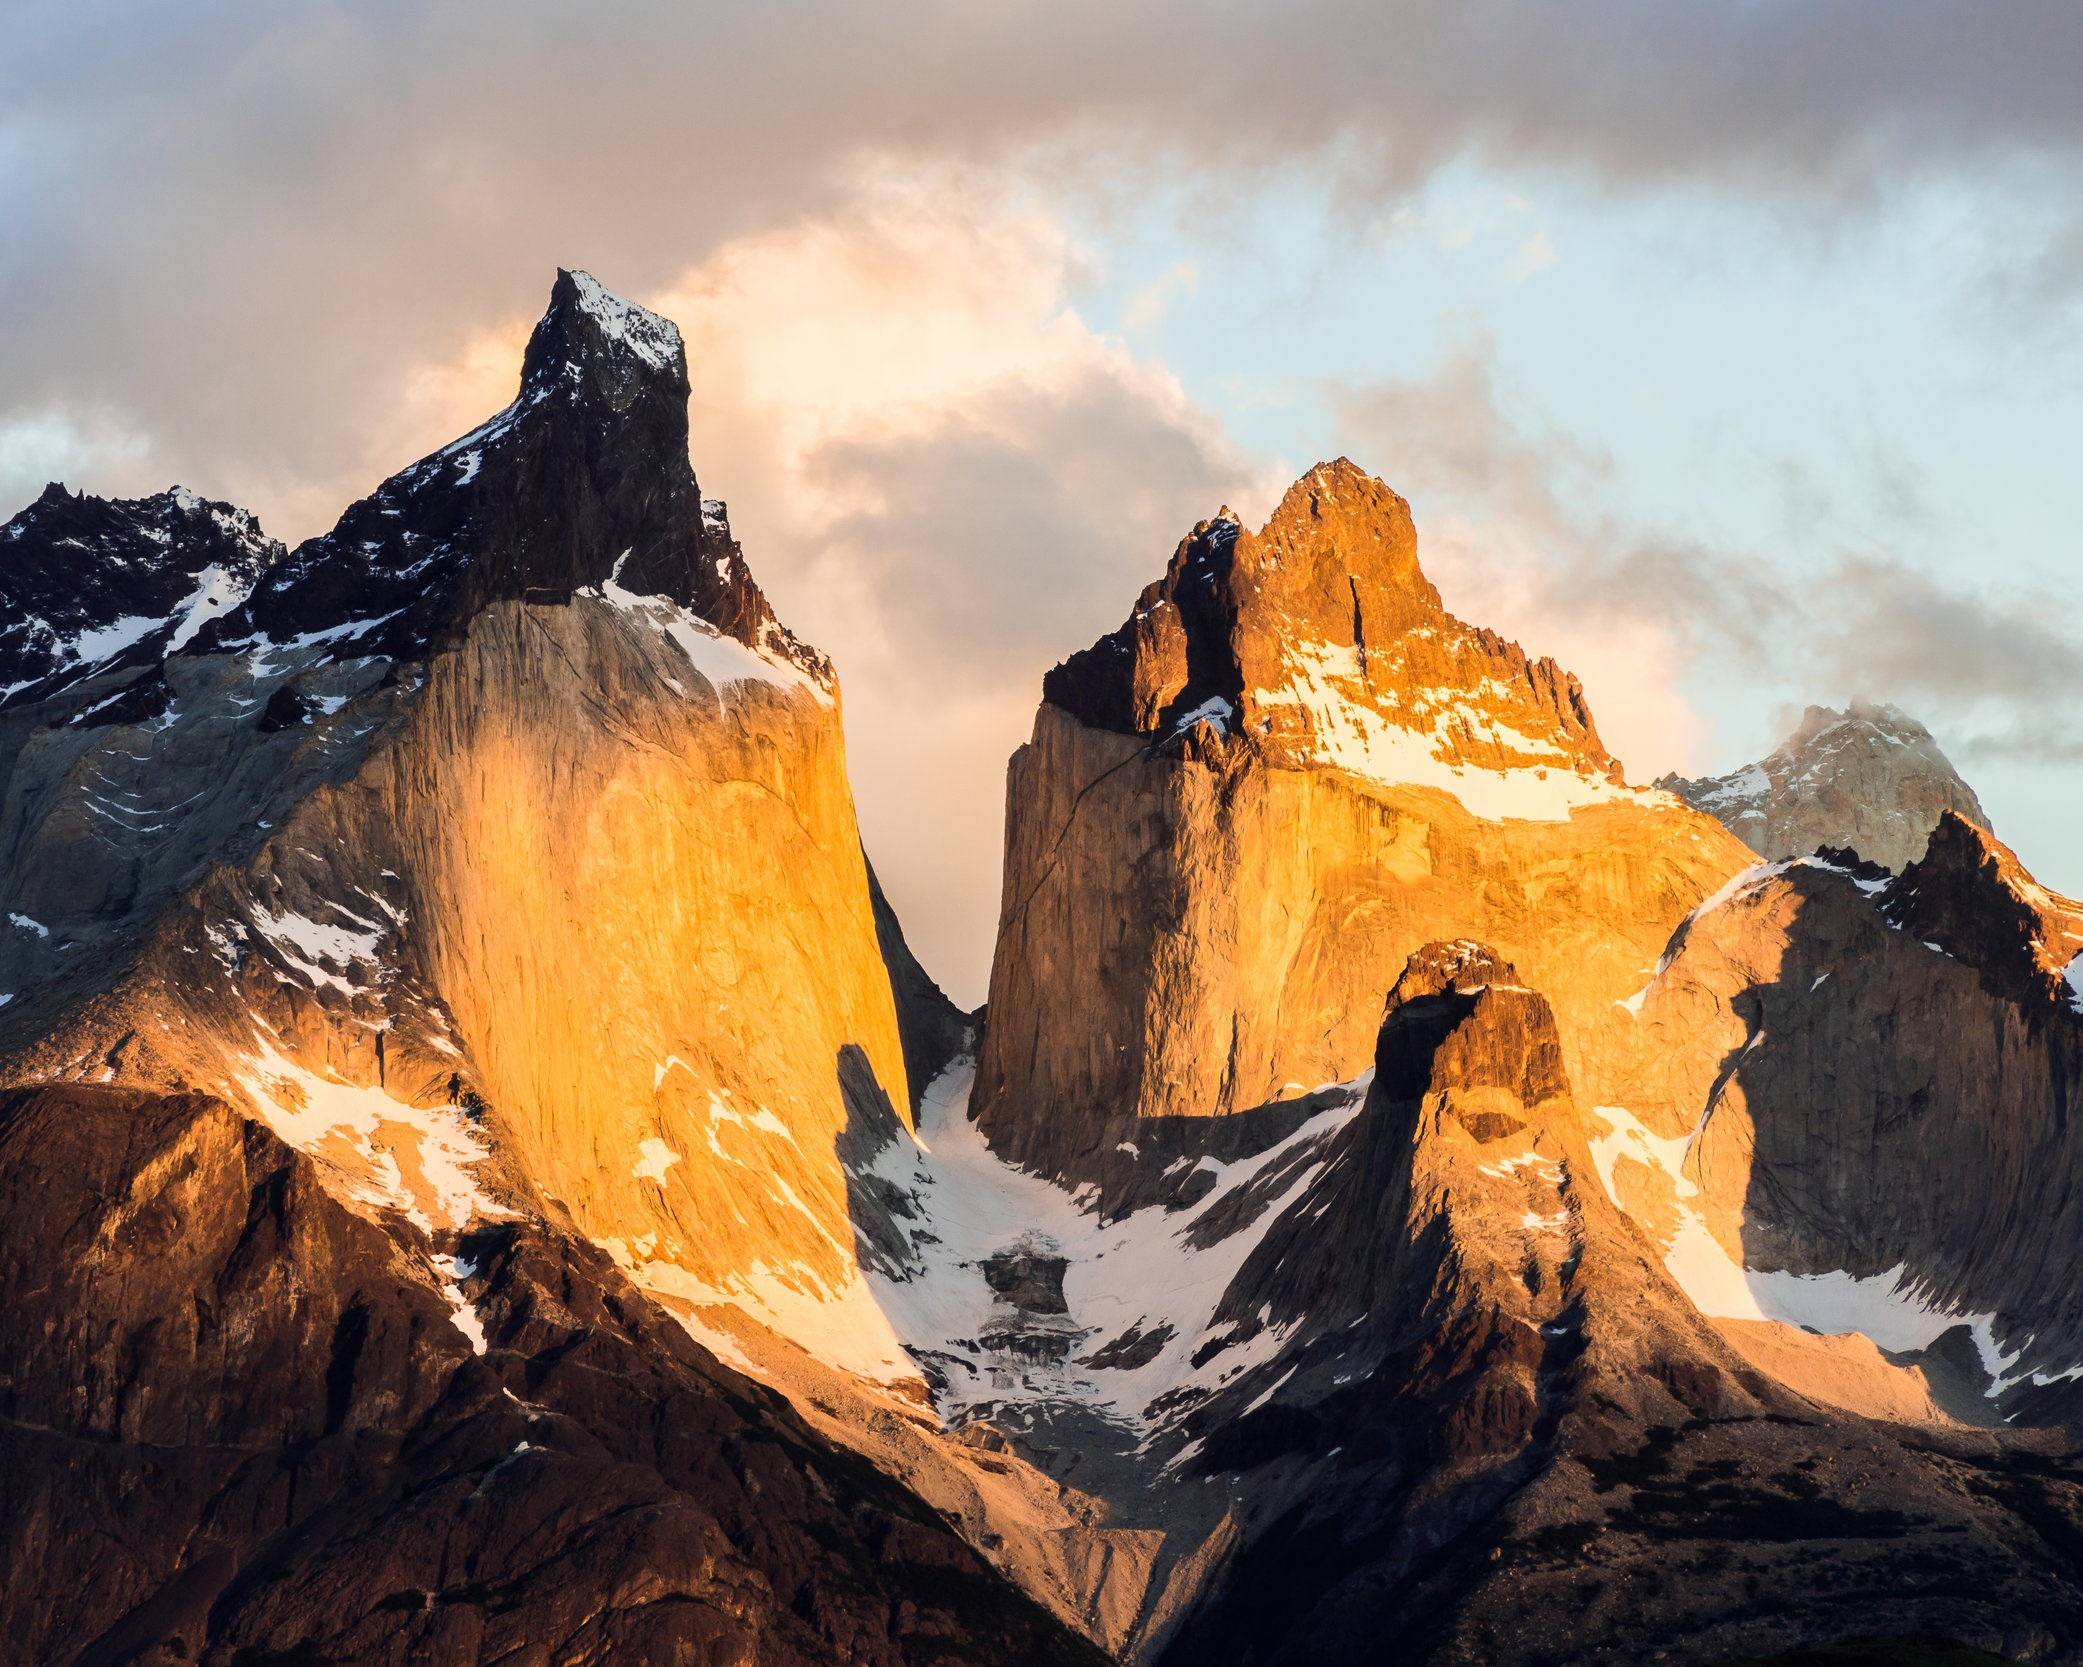 """Sueño dorado del sol"" Cuernos. Horns. Torres del Paine National Park. Región de Magallanes, Chile......#mountains #horns #sunrise #landscapes #breathtaking #Chile #patagonia #soloTrip #worldplaces #breathtaking #hiking #nakedplanet #mountains #instagood #instadaily #passionpassport #roadtrip #exploring #southAmerica #patagonia #latinAmerica #discoversouthamerica #torresDelPaine #roamtheplanet #theworldshotz #travelandlife #igshotz"